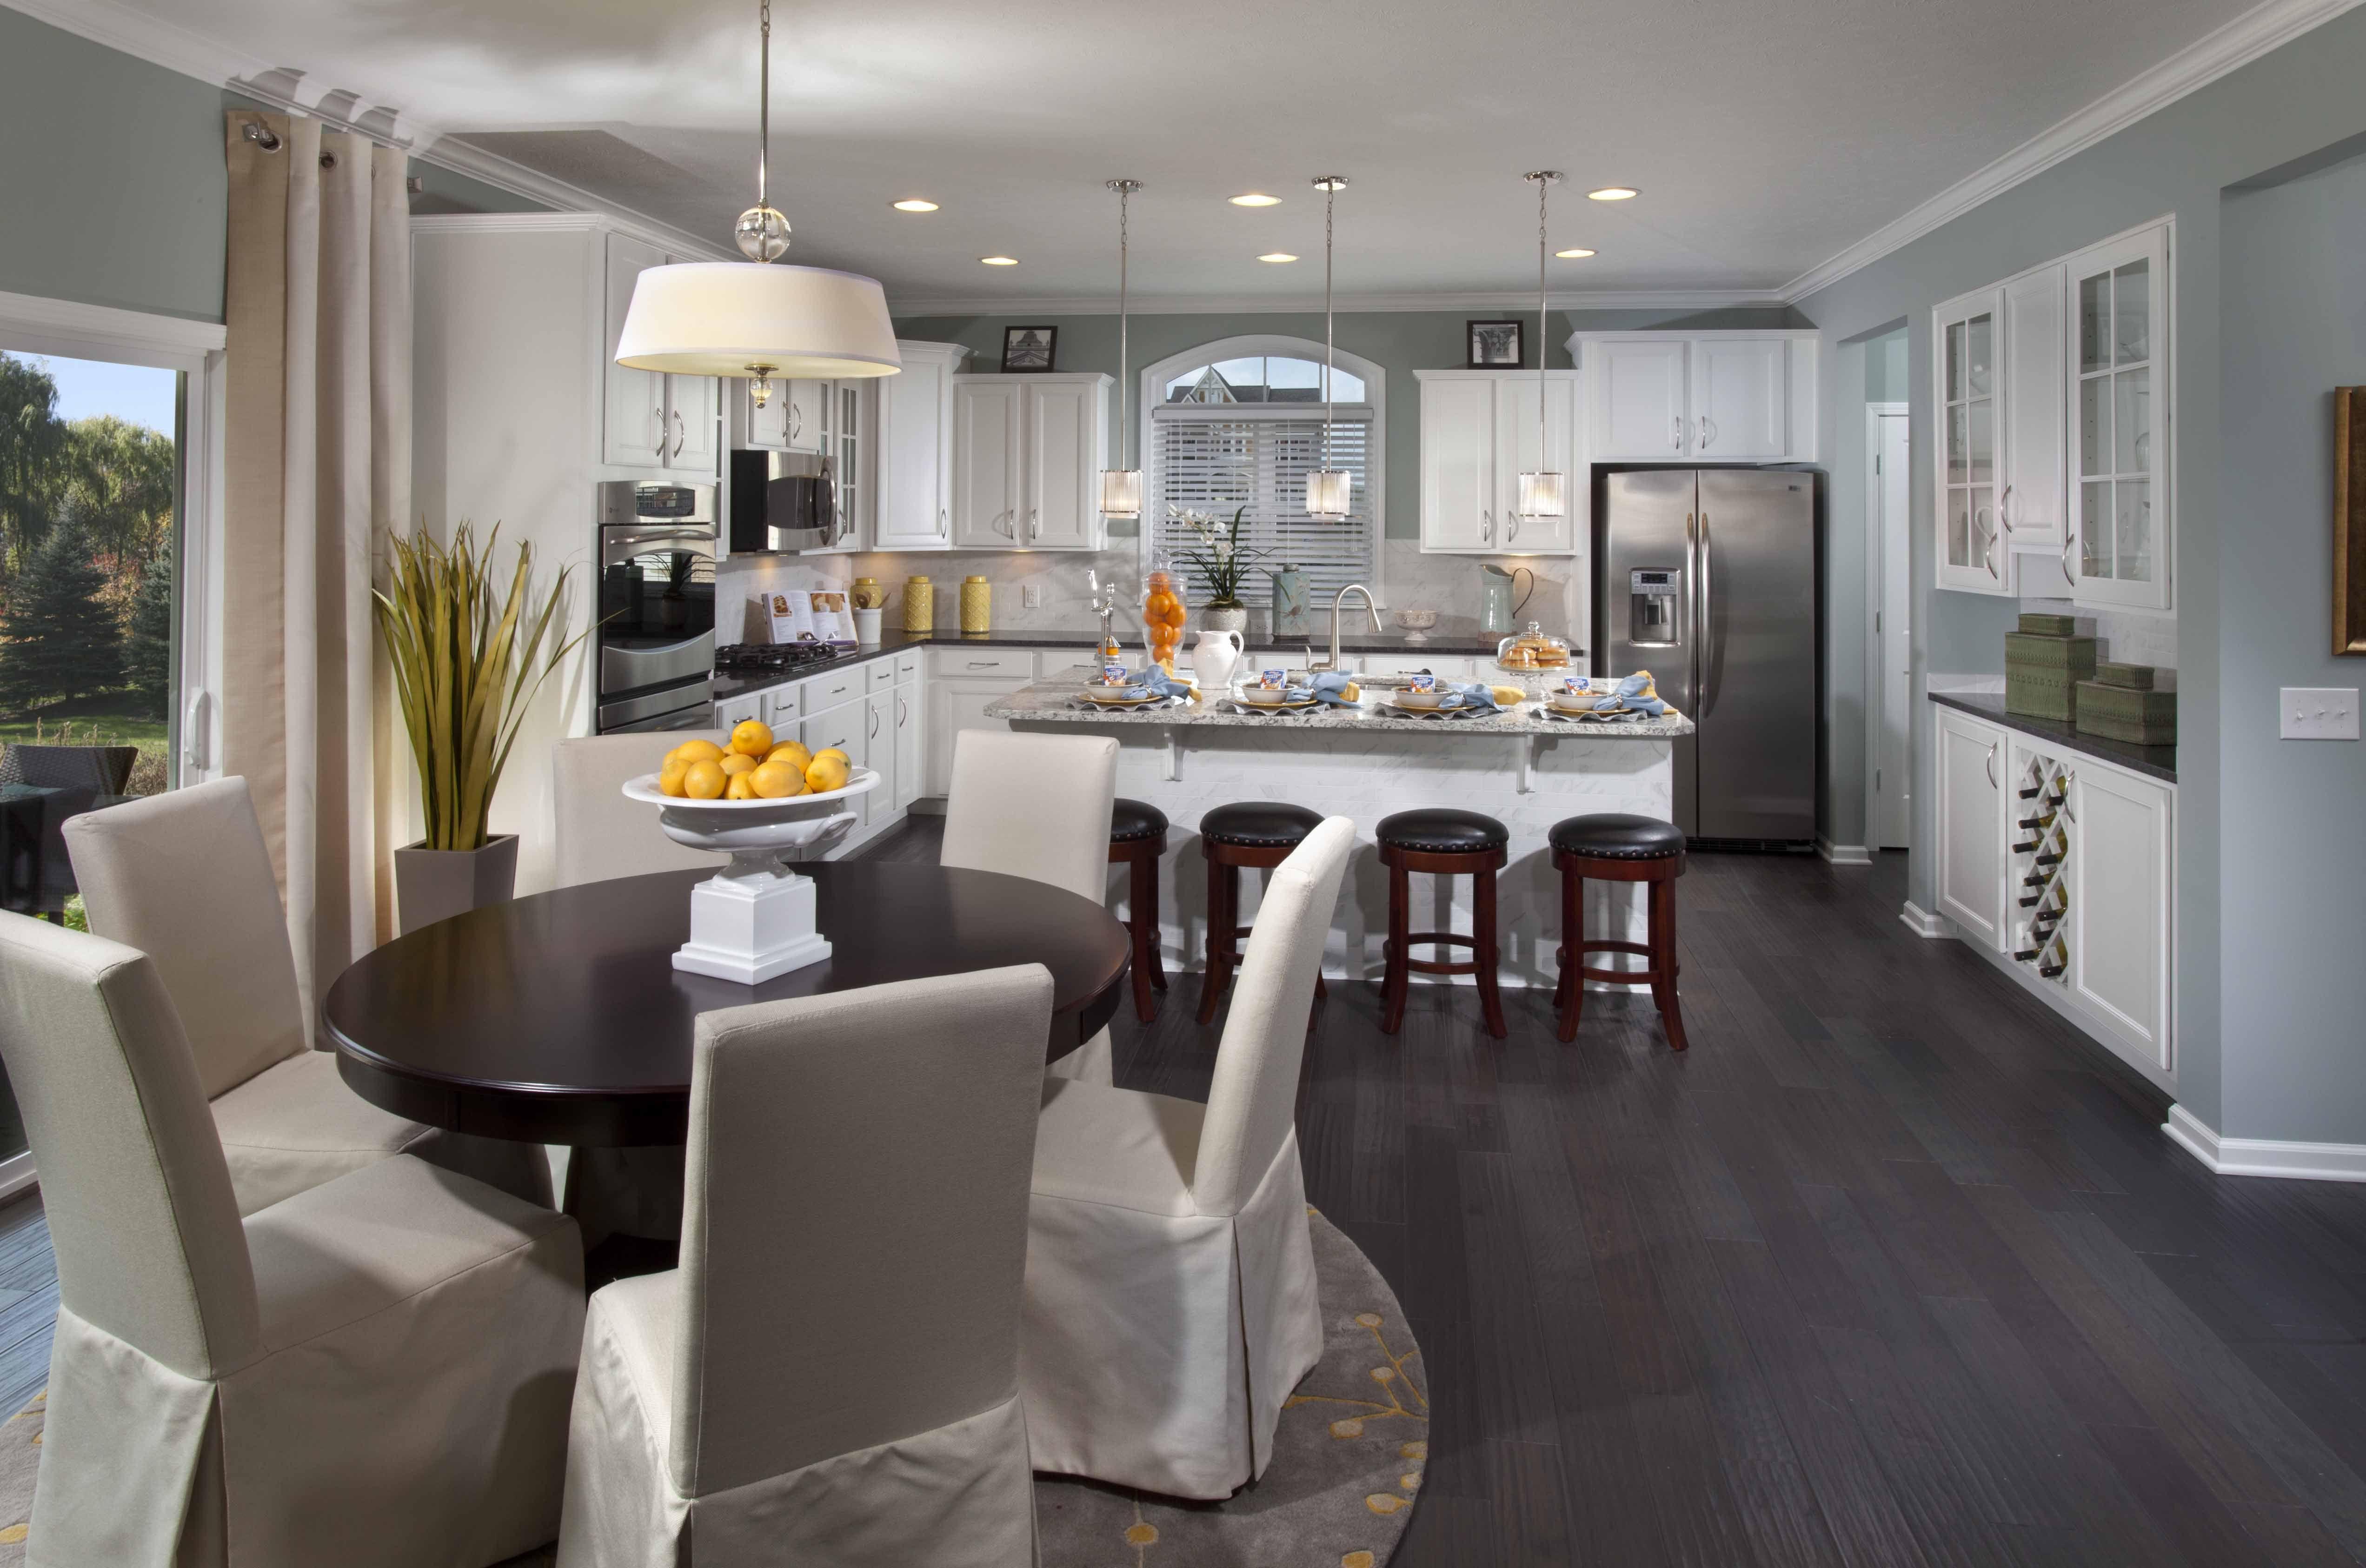 ryland southill model at blackstone kitchen - Blackstone Home Design